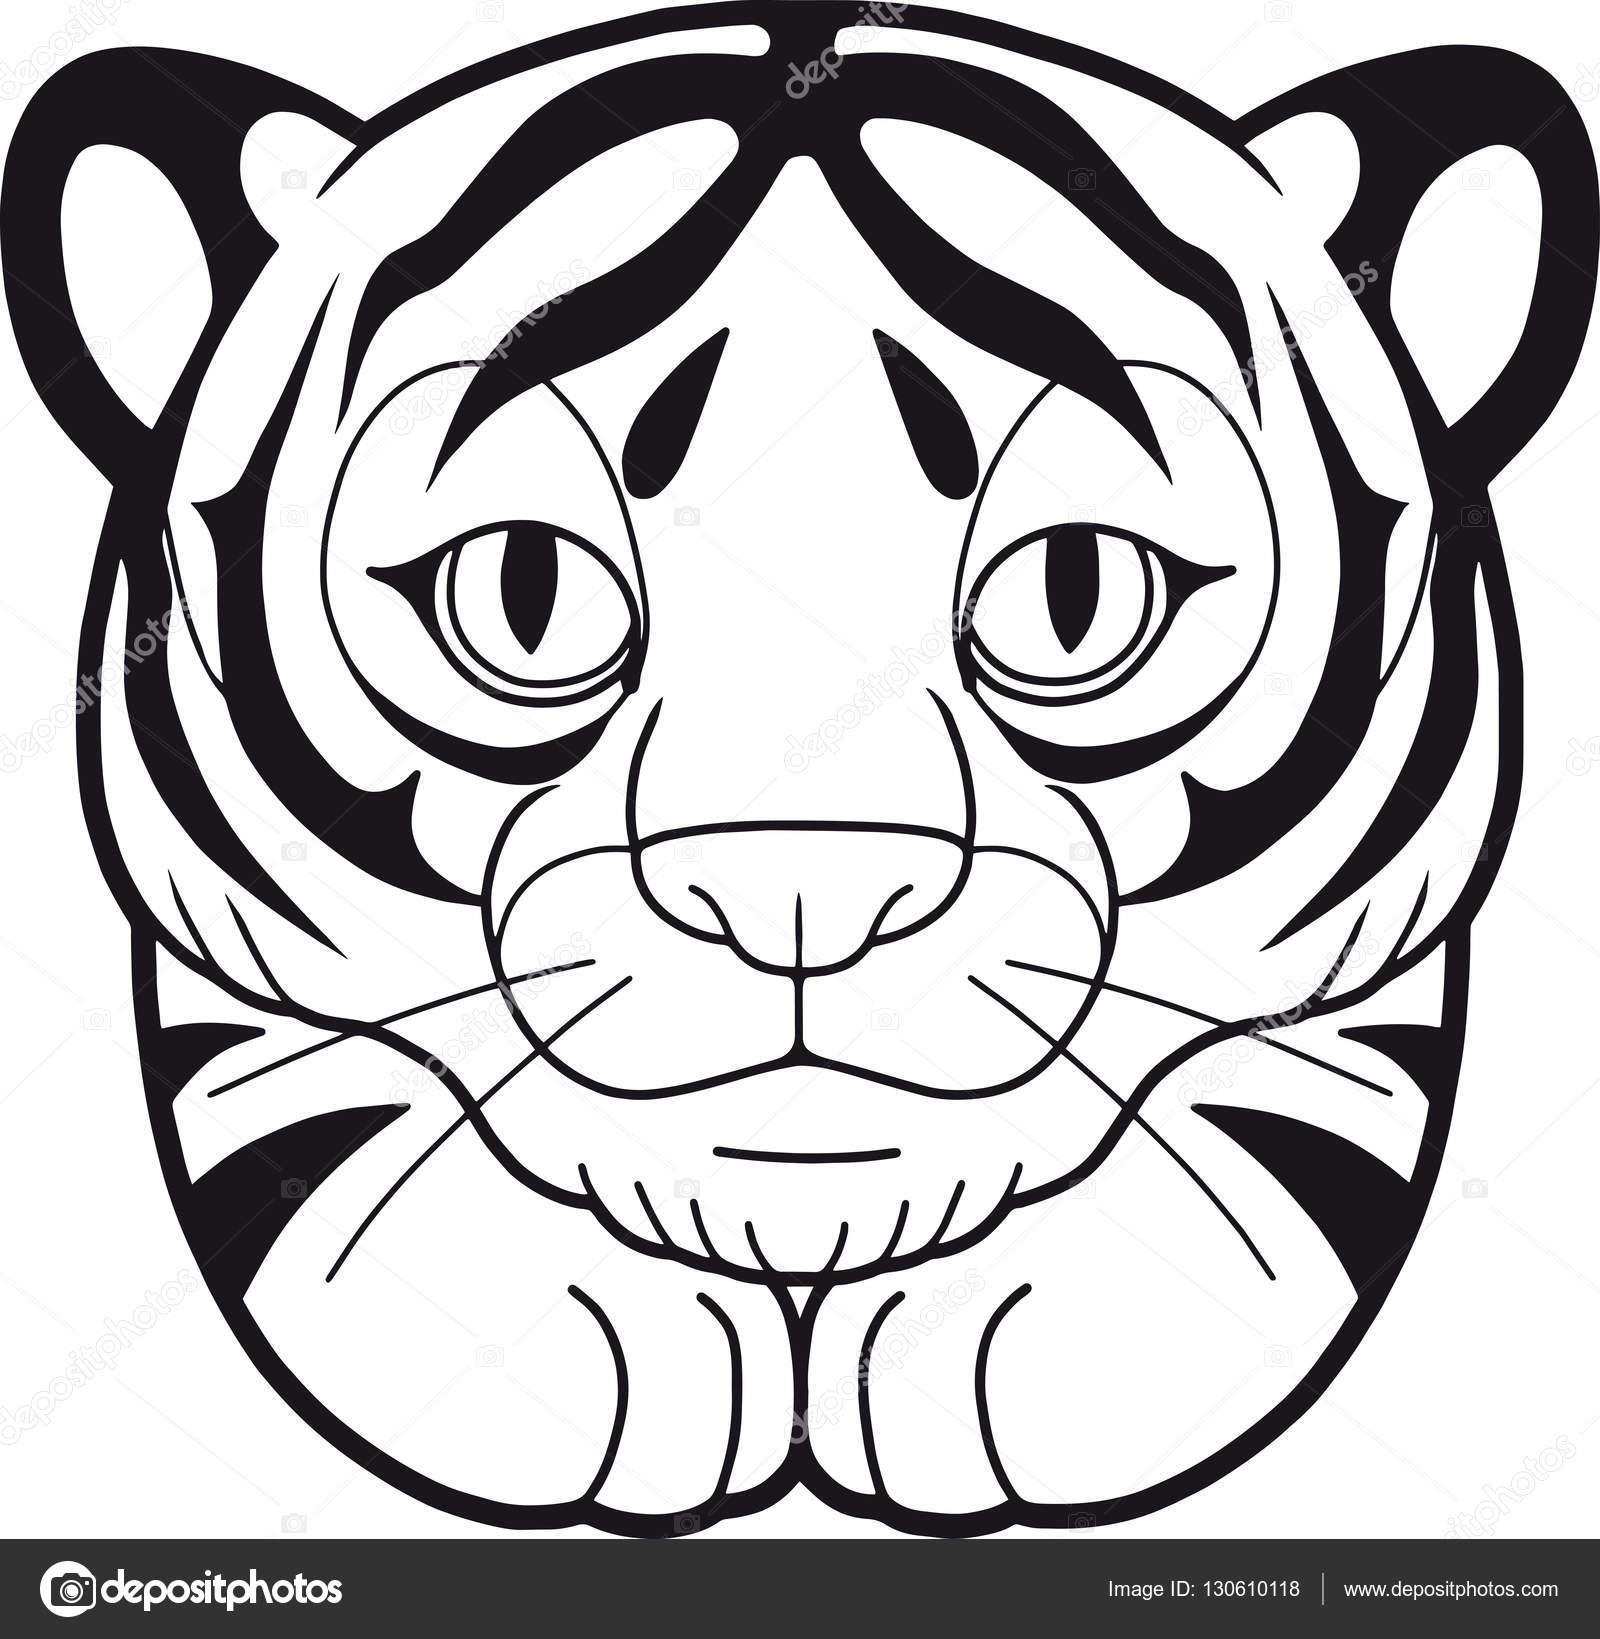 Tigre lindo ilustración — Vector de stock © Fargon #130610118